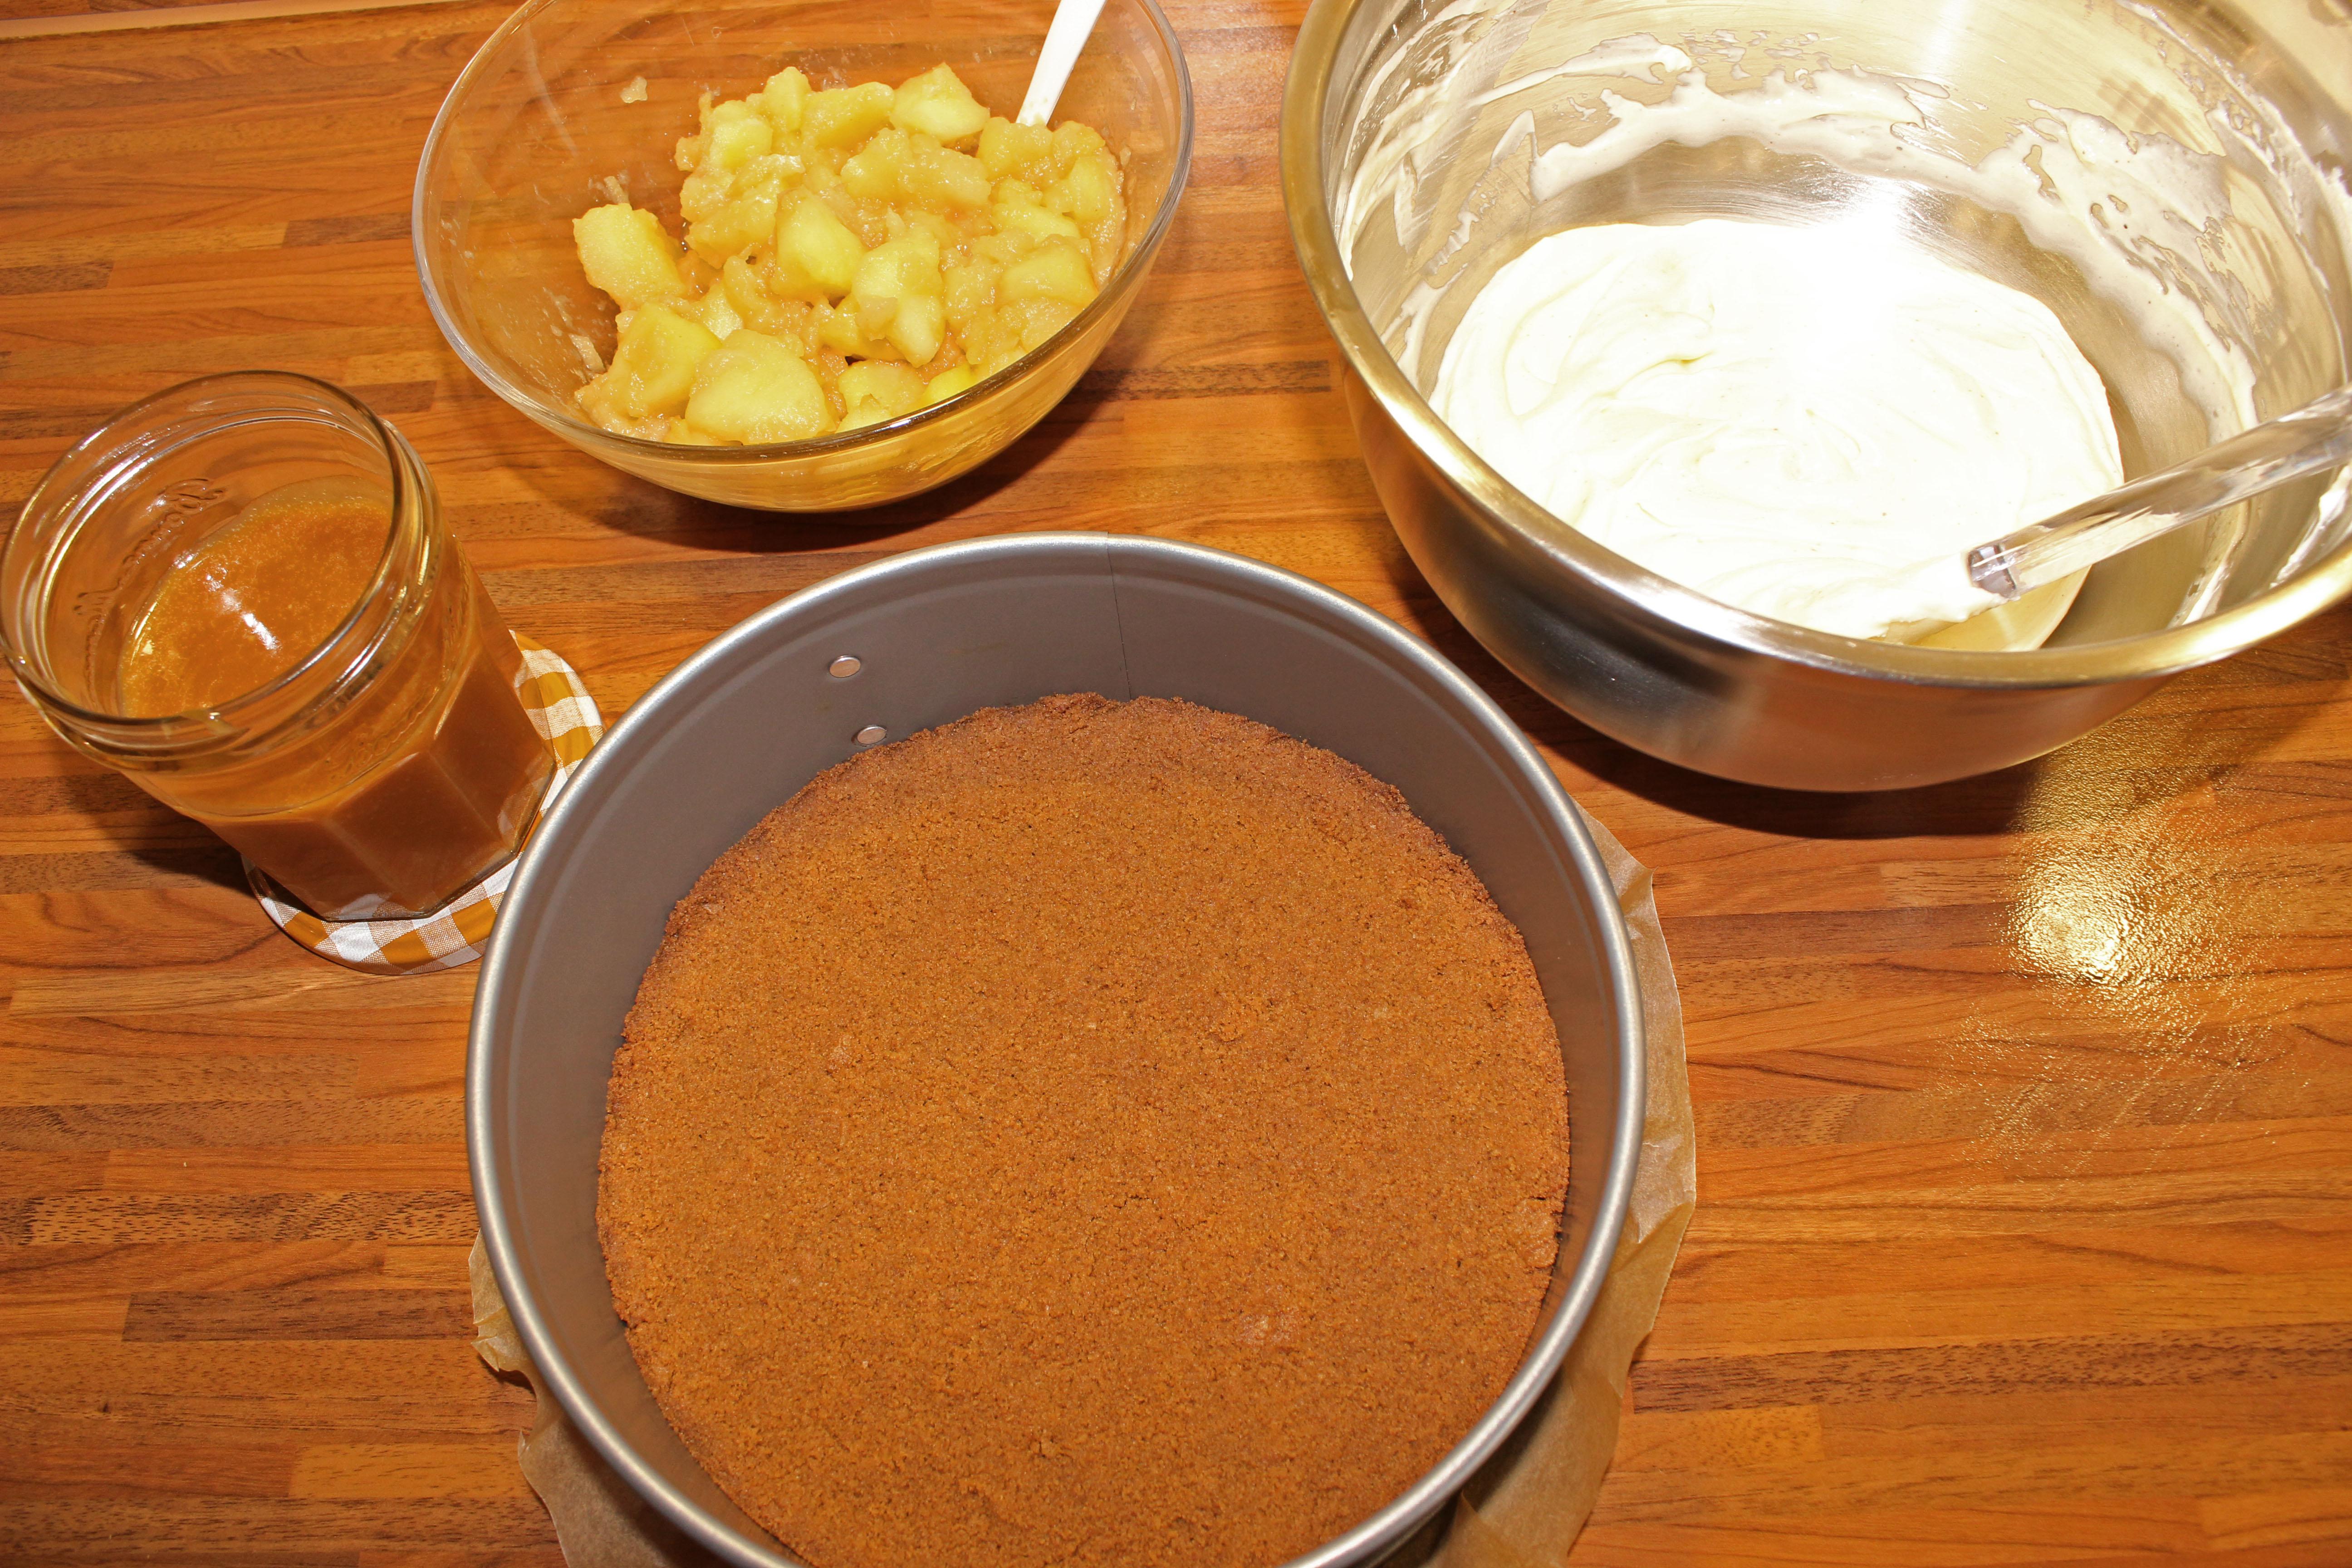 Karamell-Apfel-Cheesecake_b4391_bearbeitet-1